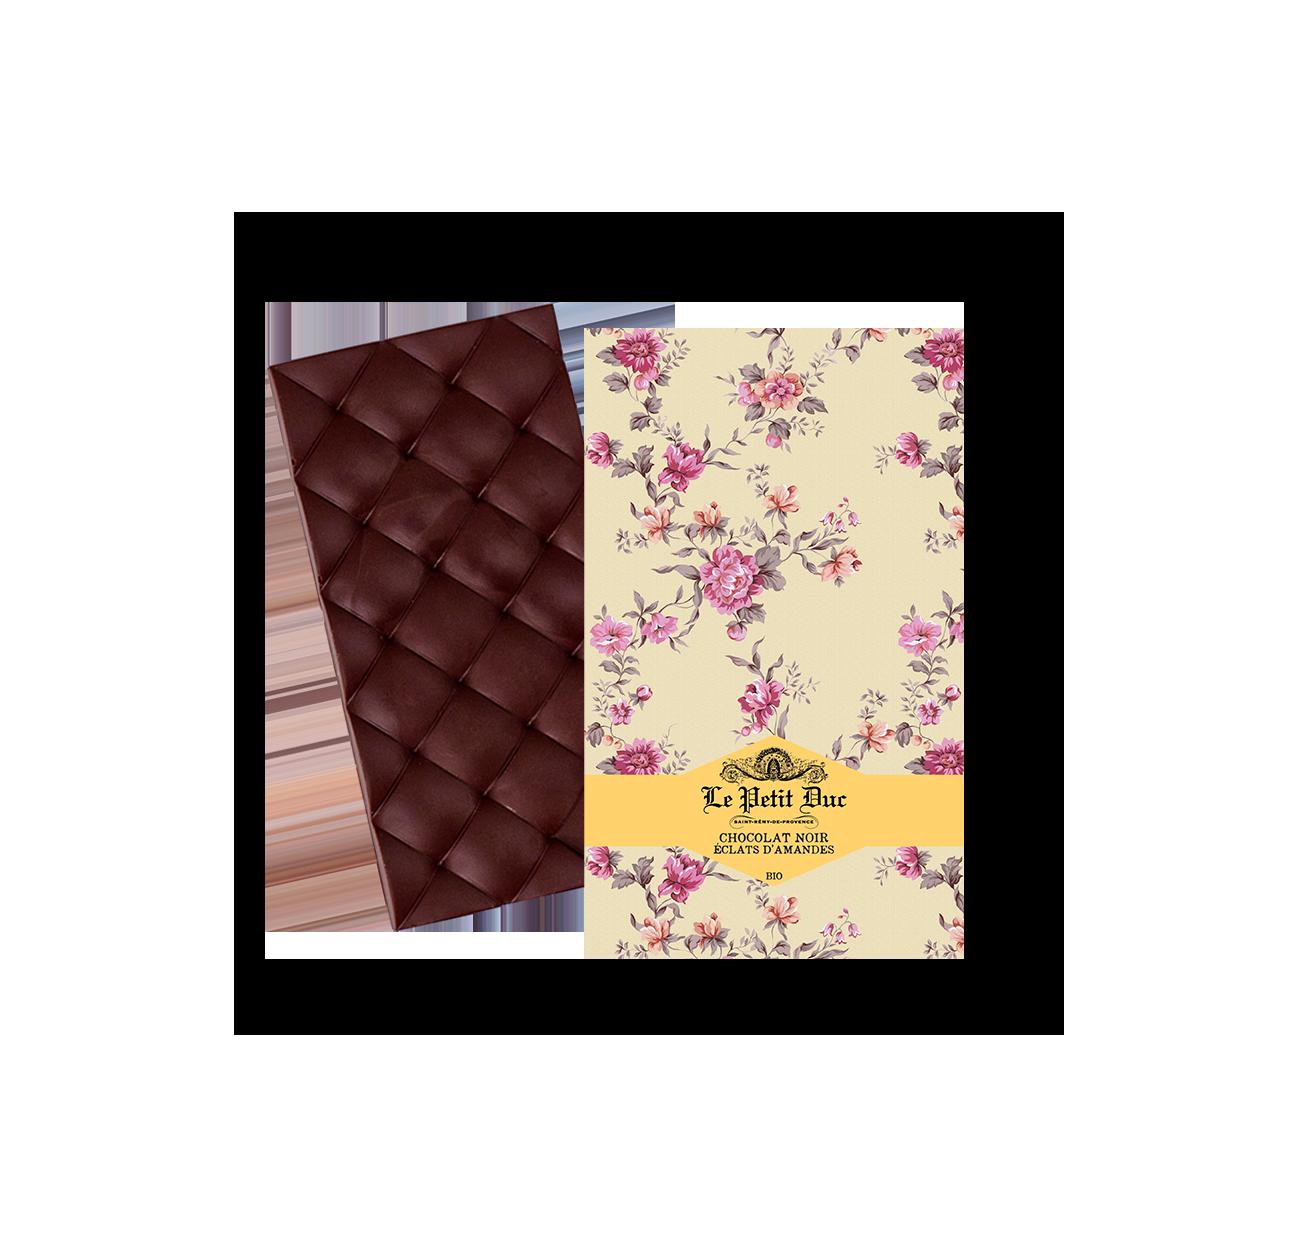 04/ Mørk sjokolade med knuste mandler, 70g - Le Petit Duc